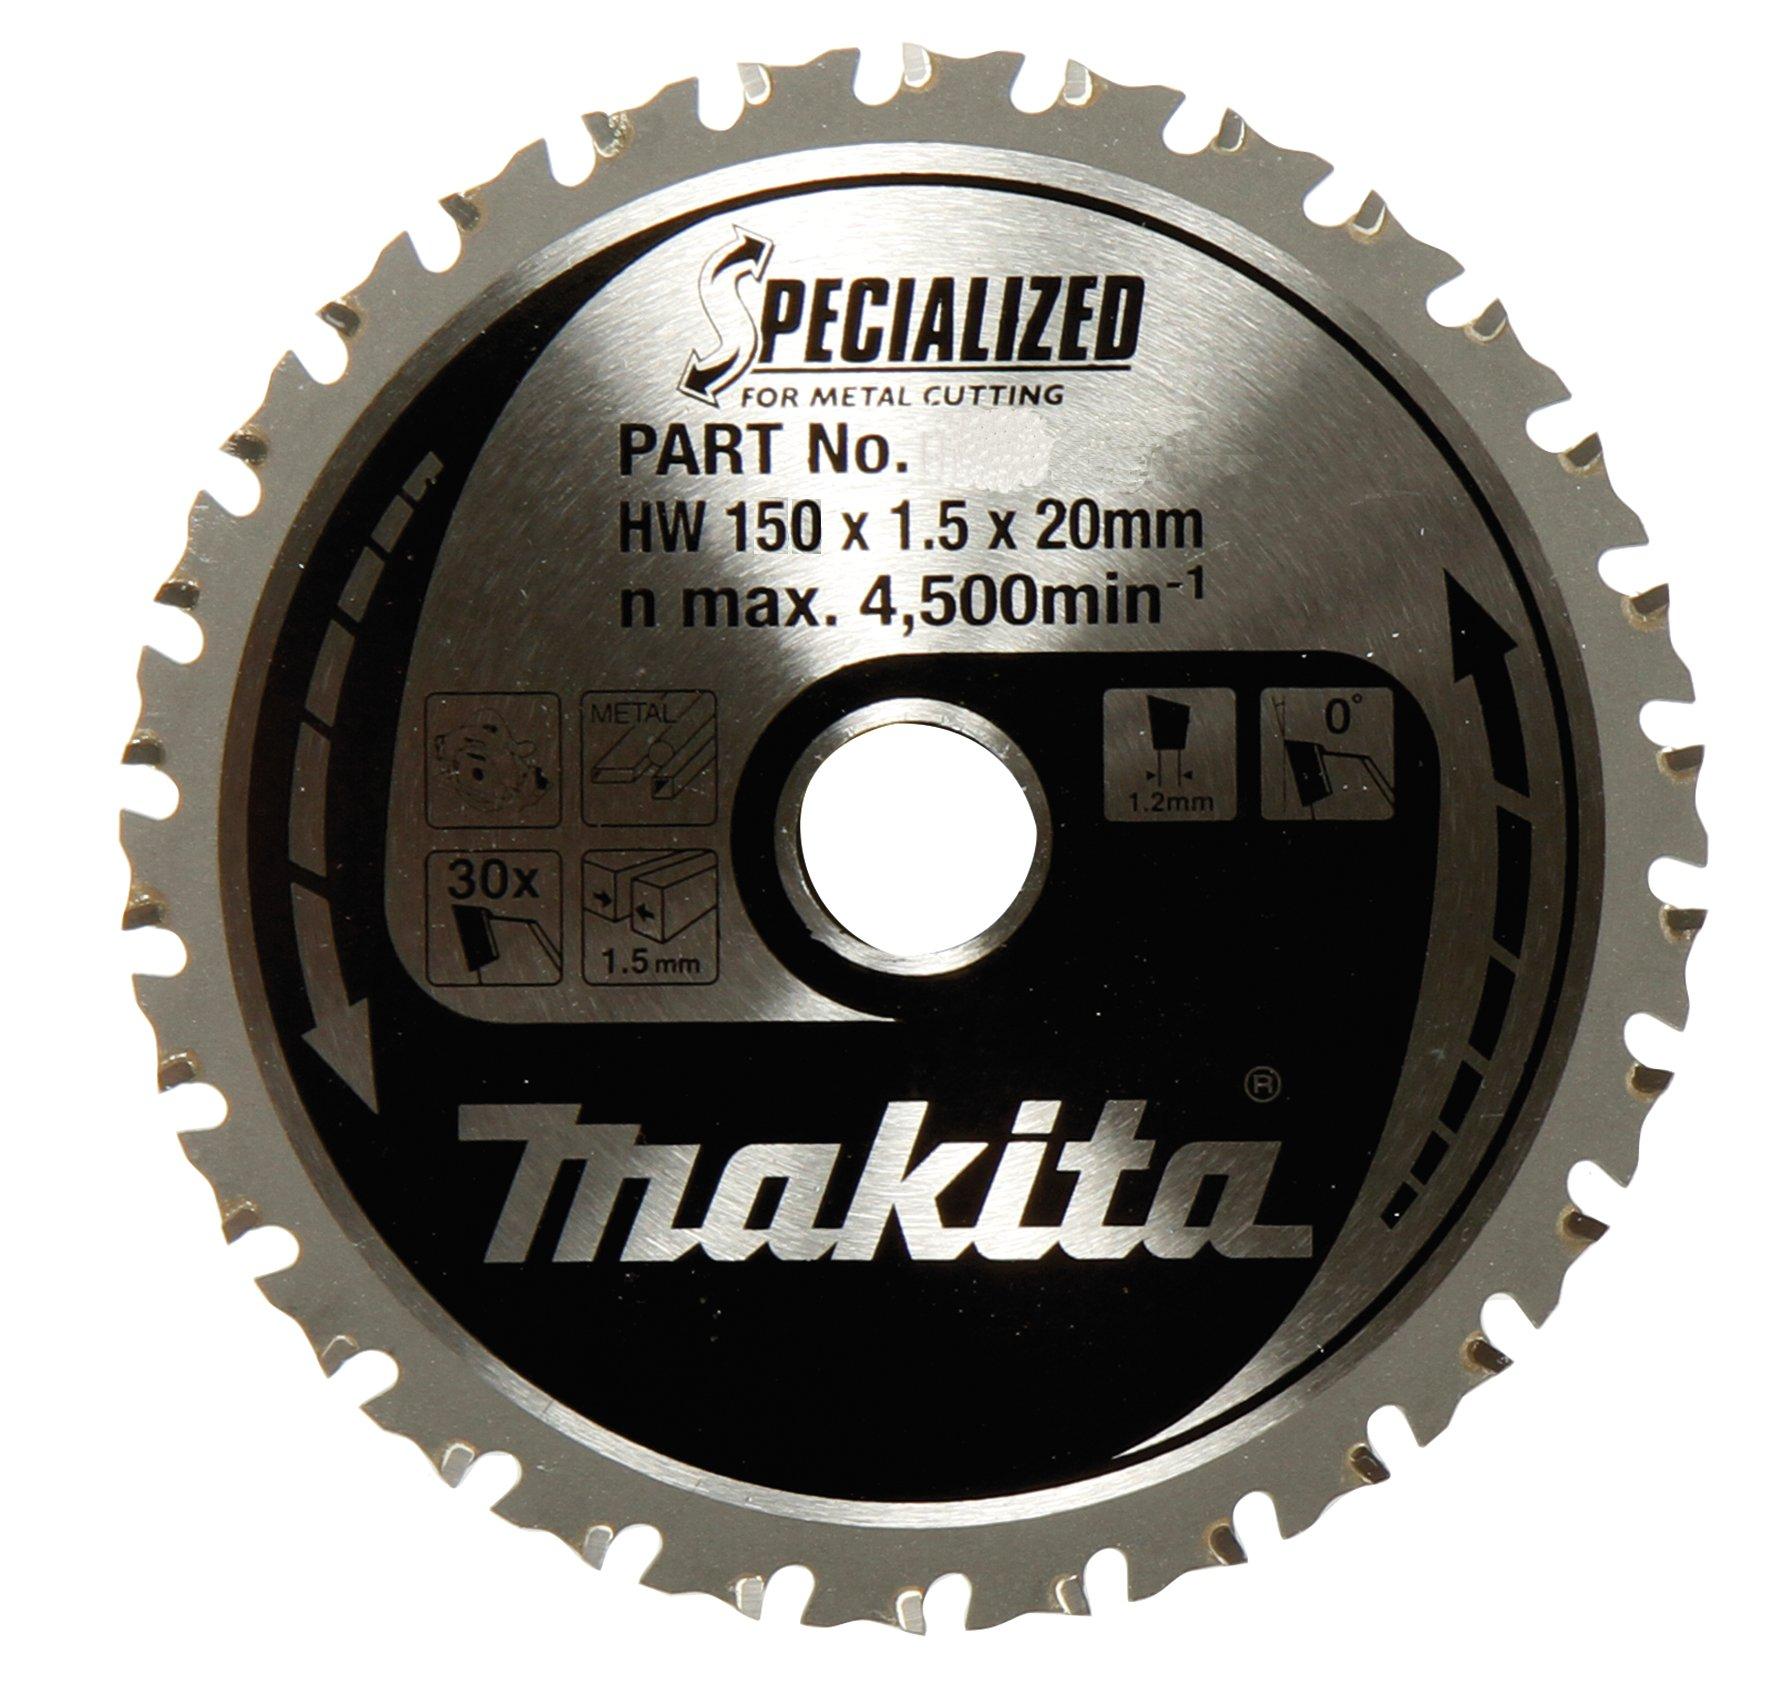 Makita A-96126 Aluminum 52T Carbide-Tipped Saw Blade, 5-7/8''